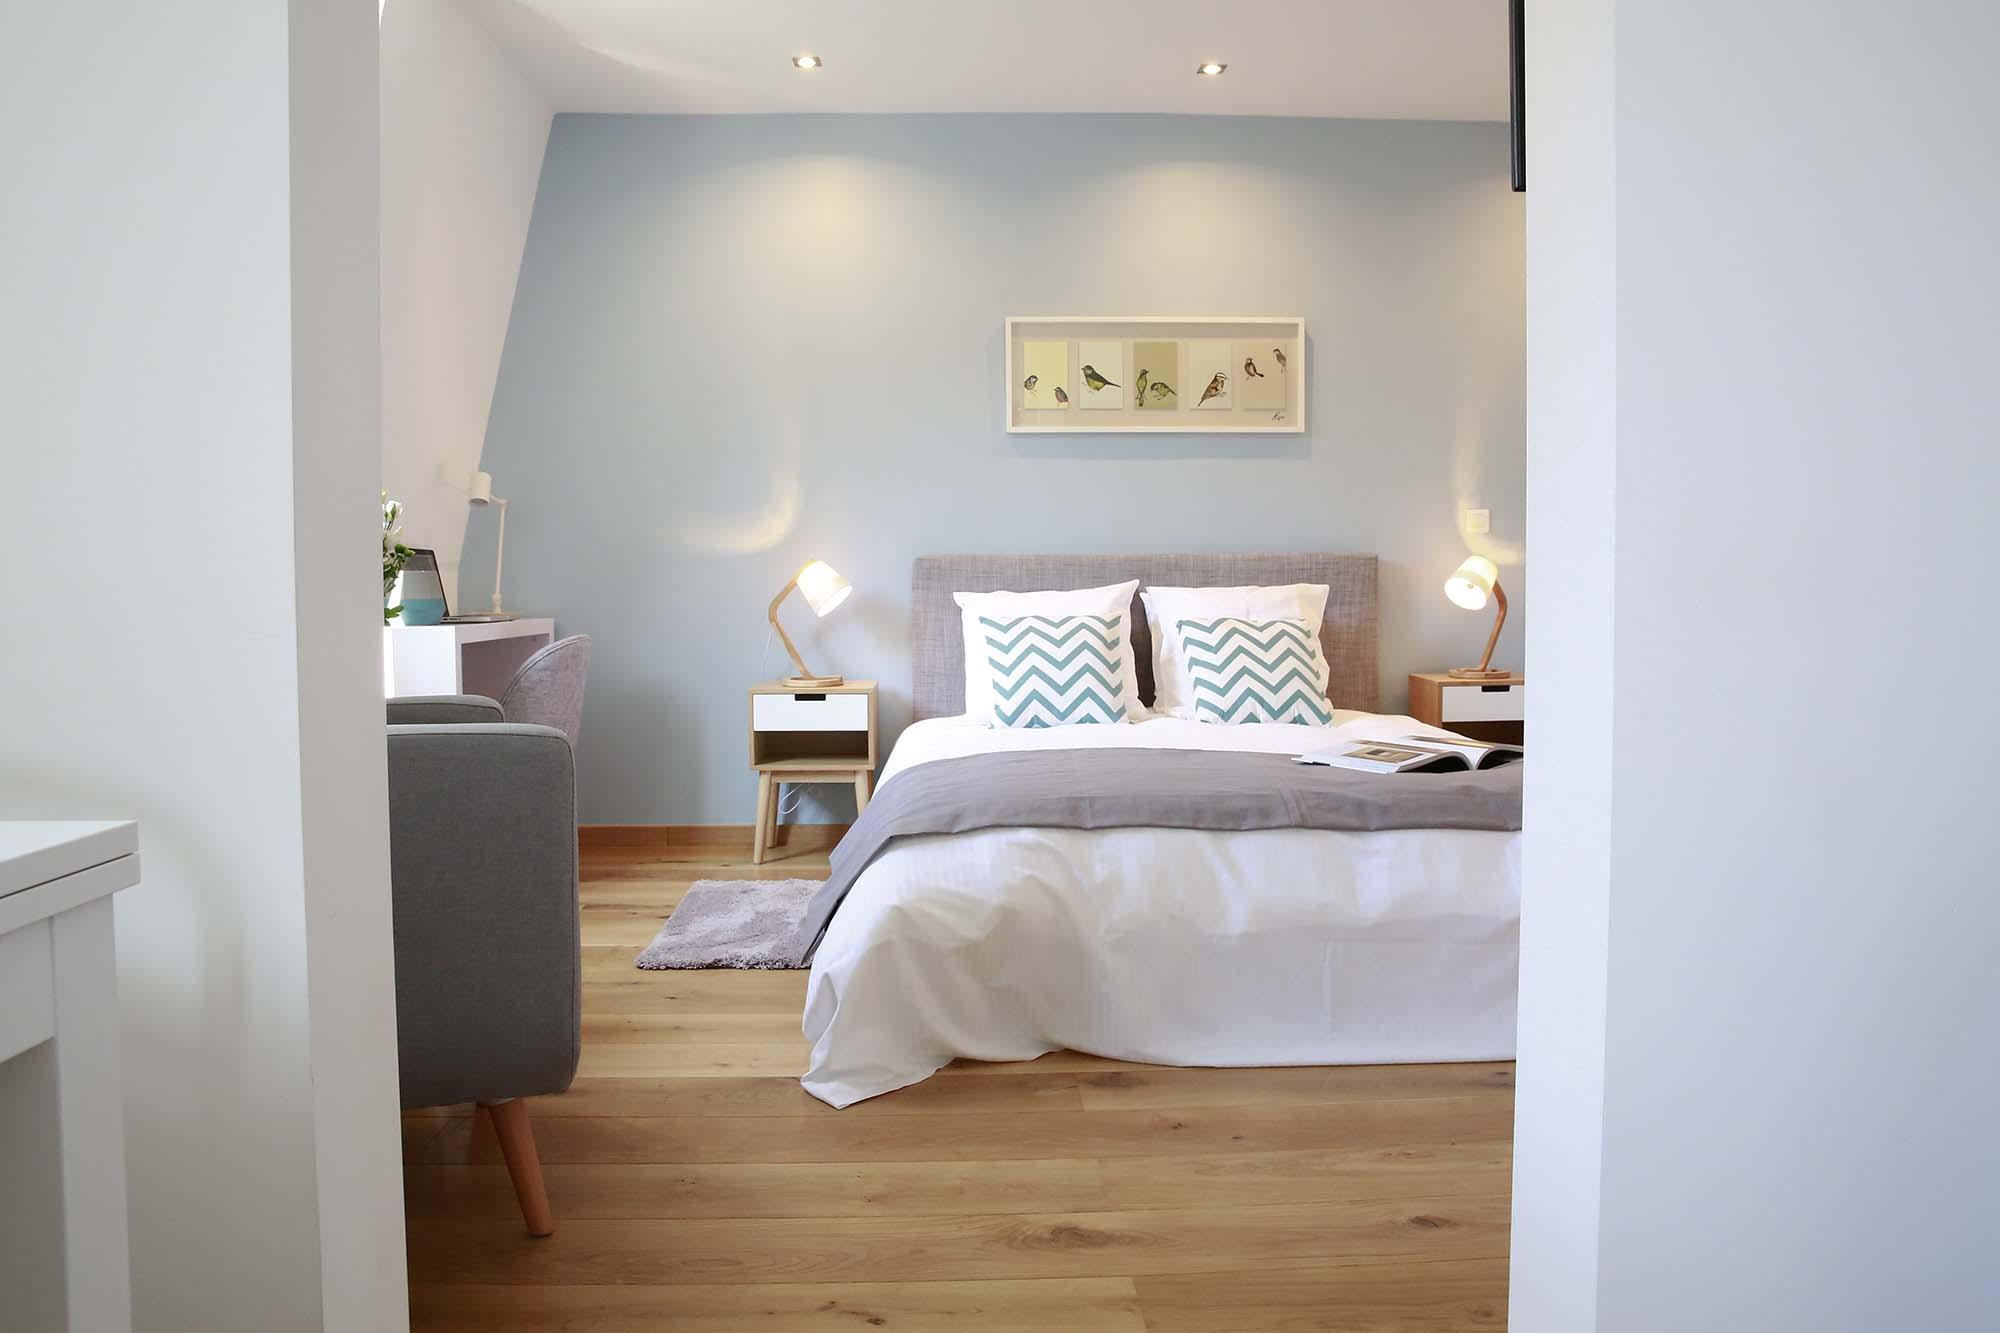 leclaridge 6786 flandres appart h tel lille. Black Bedroom Furniture Sets. Home Design Ideas